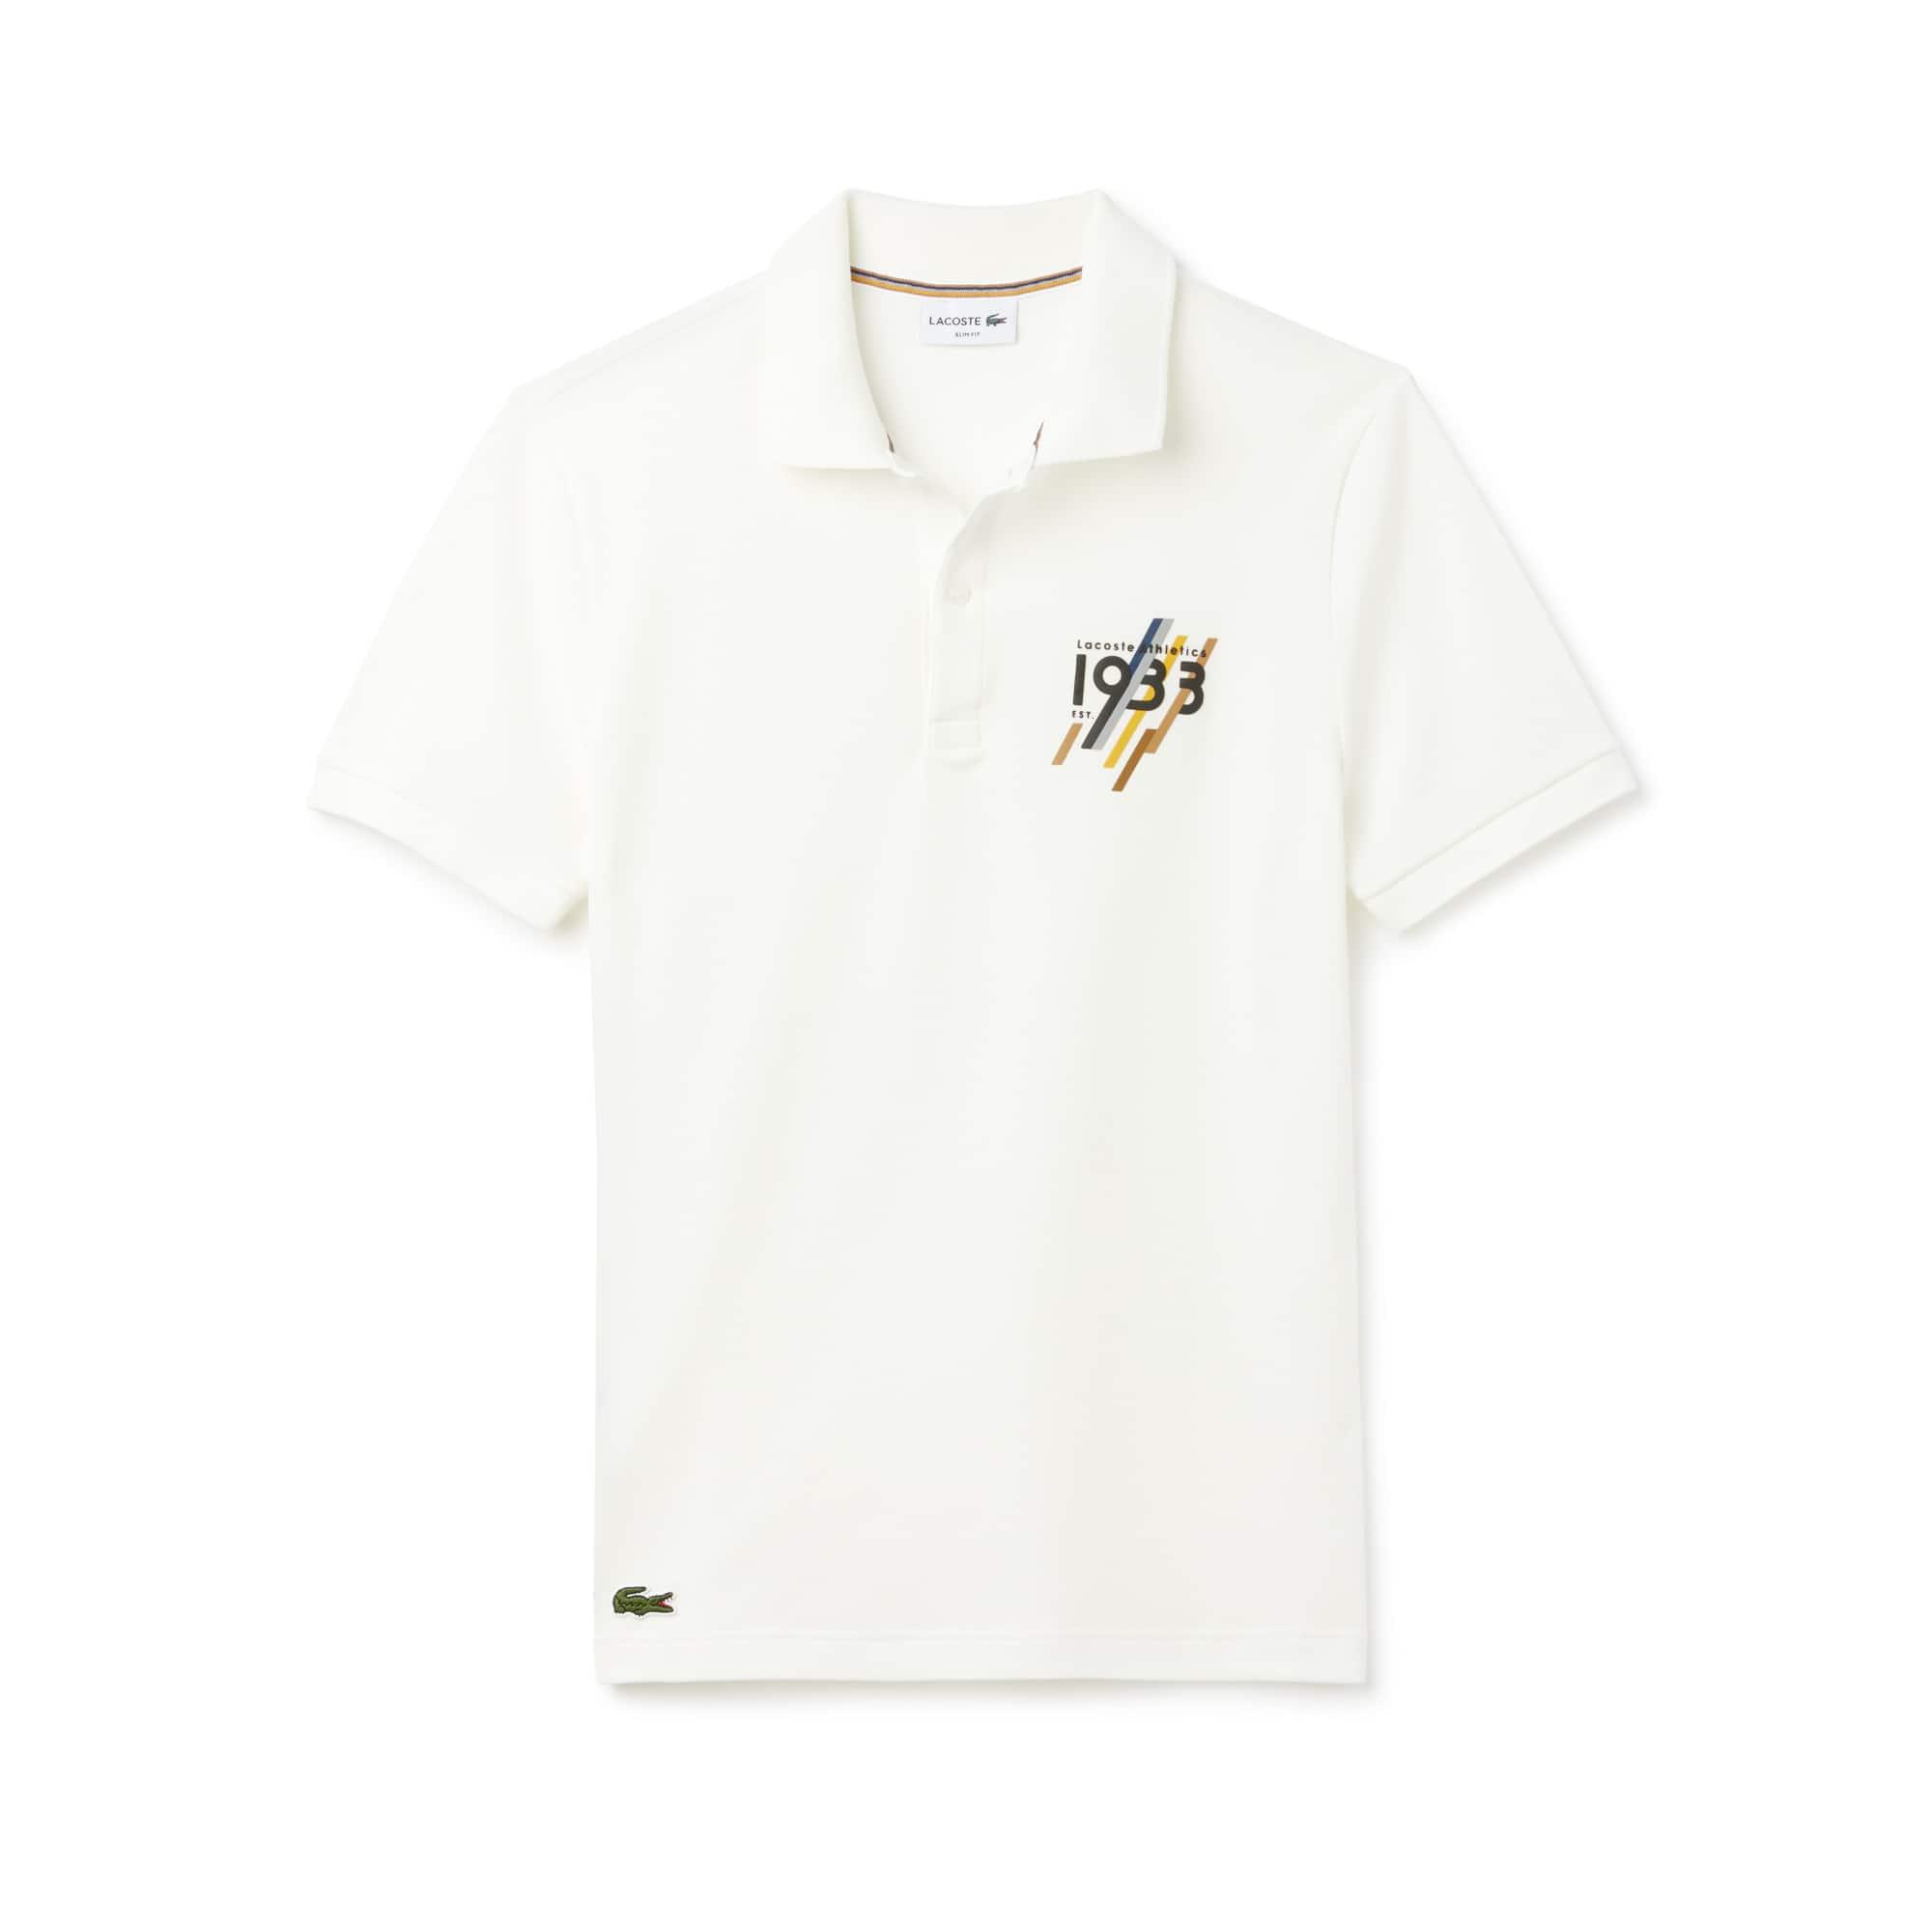 17535baee8 Men's Lacoste Slim Fit 1933 Lettering Stretch Mini Piqué Polo